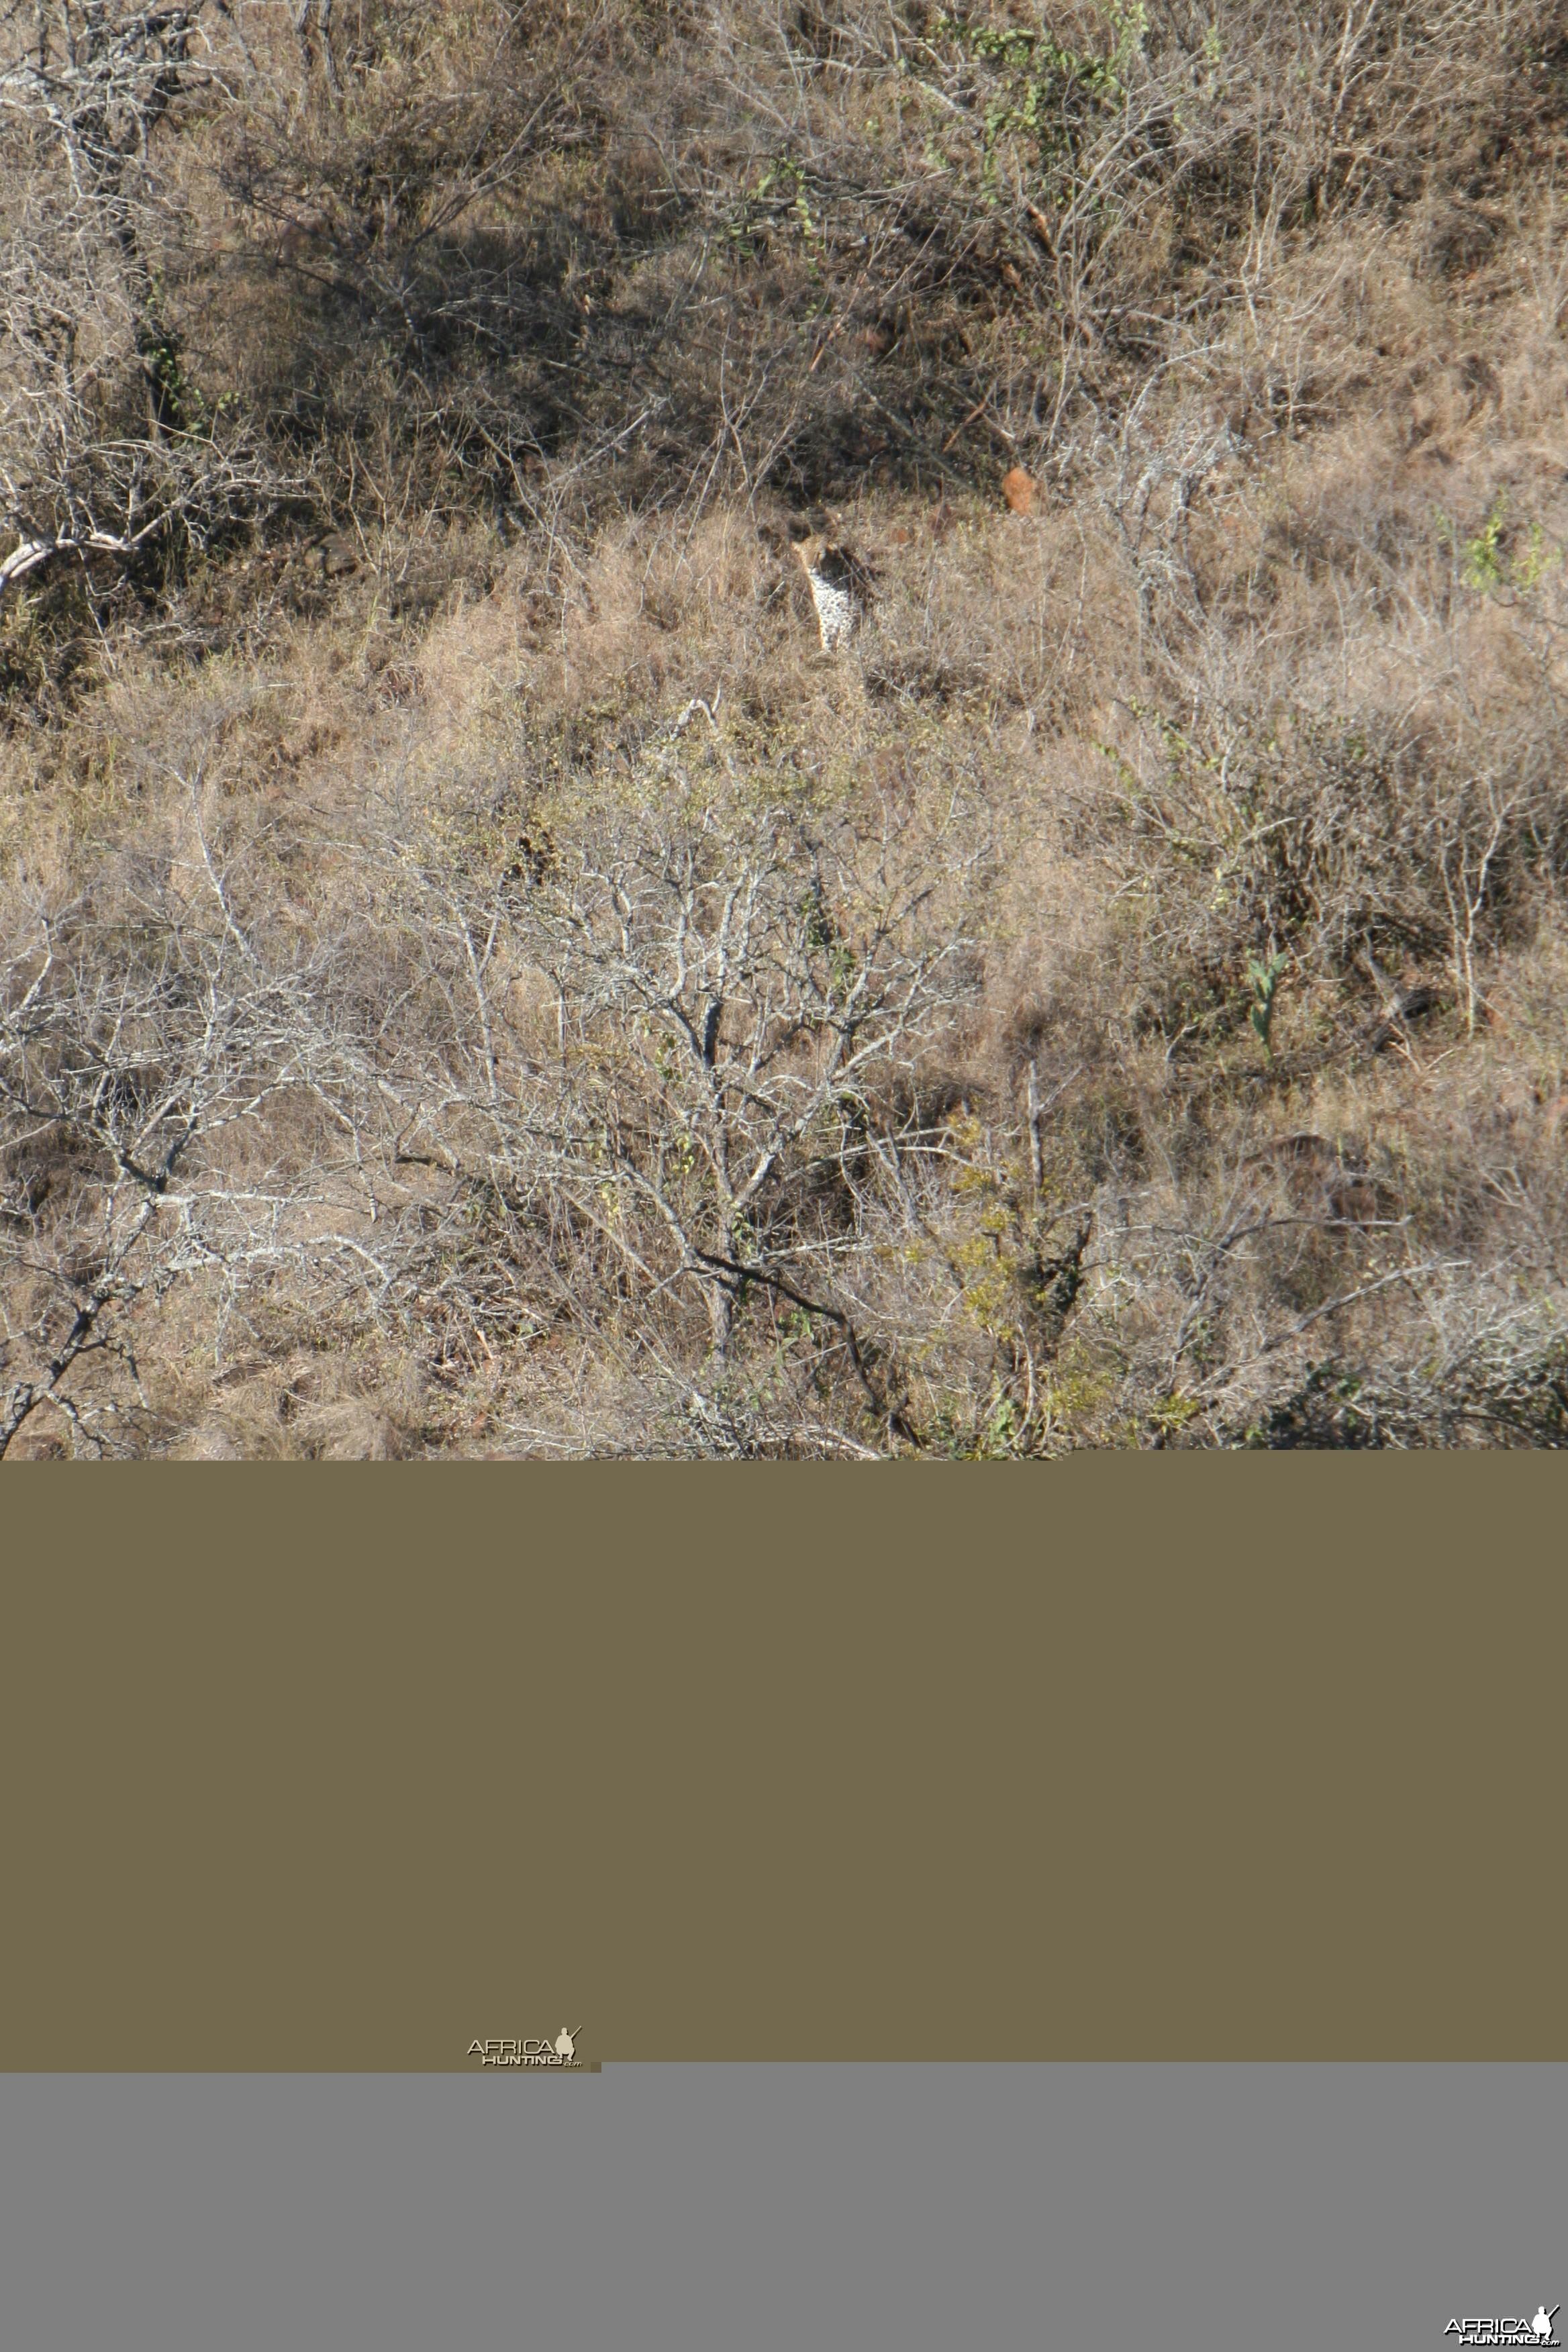 Leopard stalking Bushbuck